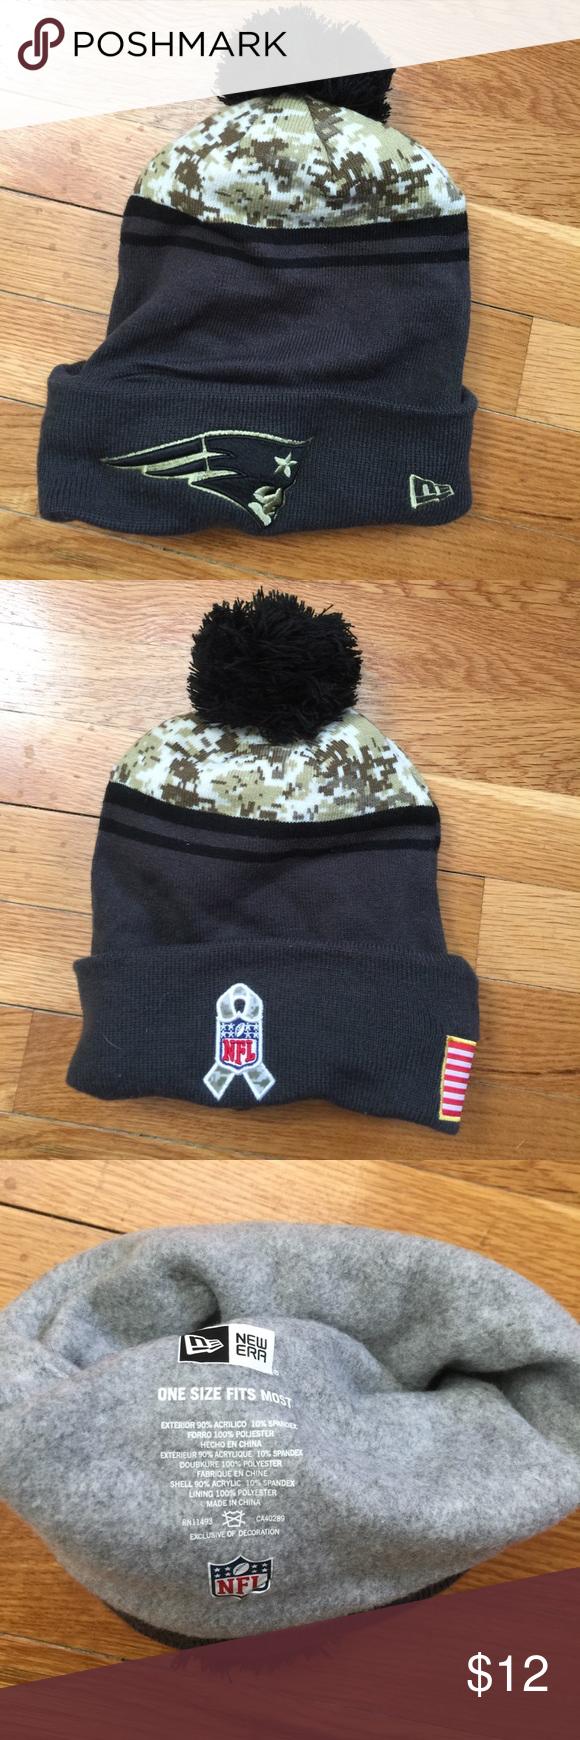 Salute to Service Patriots Hat Winter hat. Fleece lined. Never worn. NFL  Accessories Hats 8fbdd4b1b2a